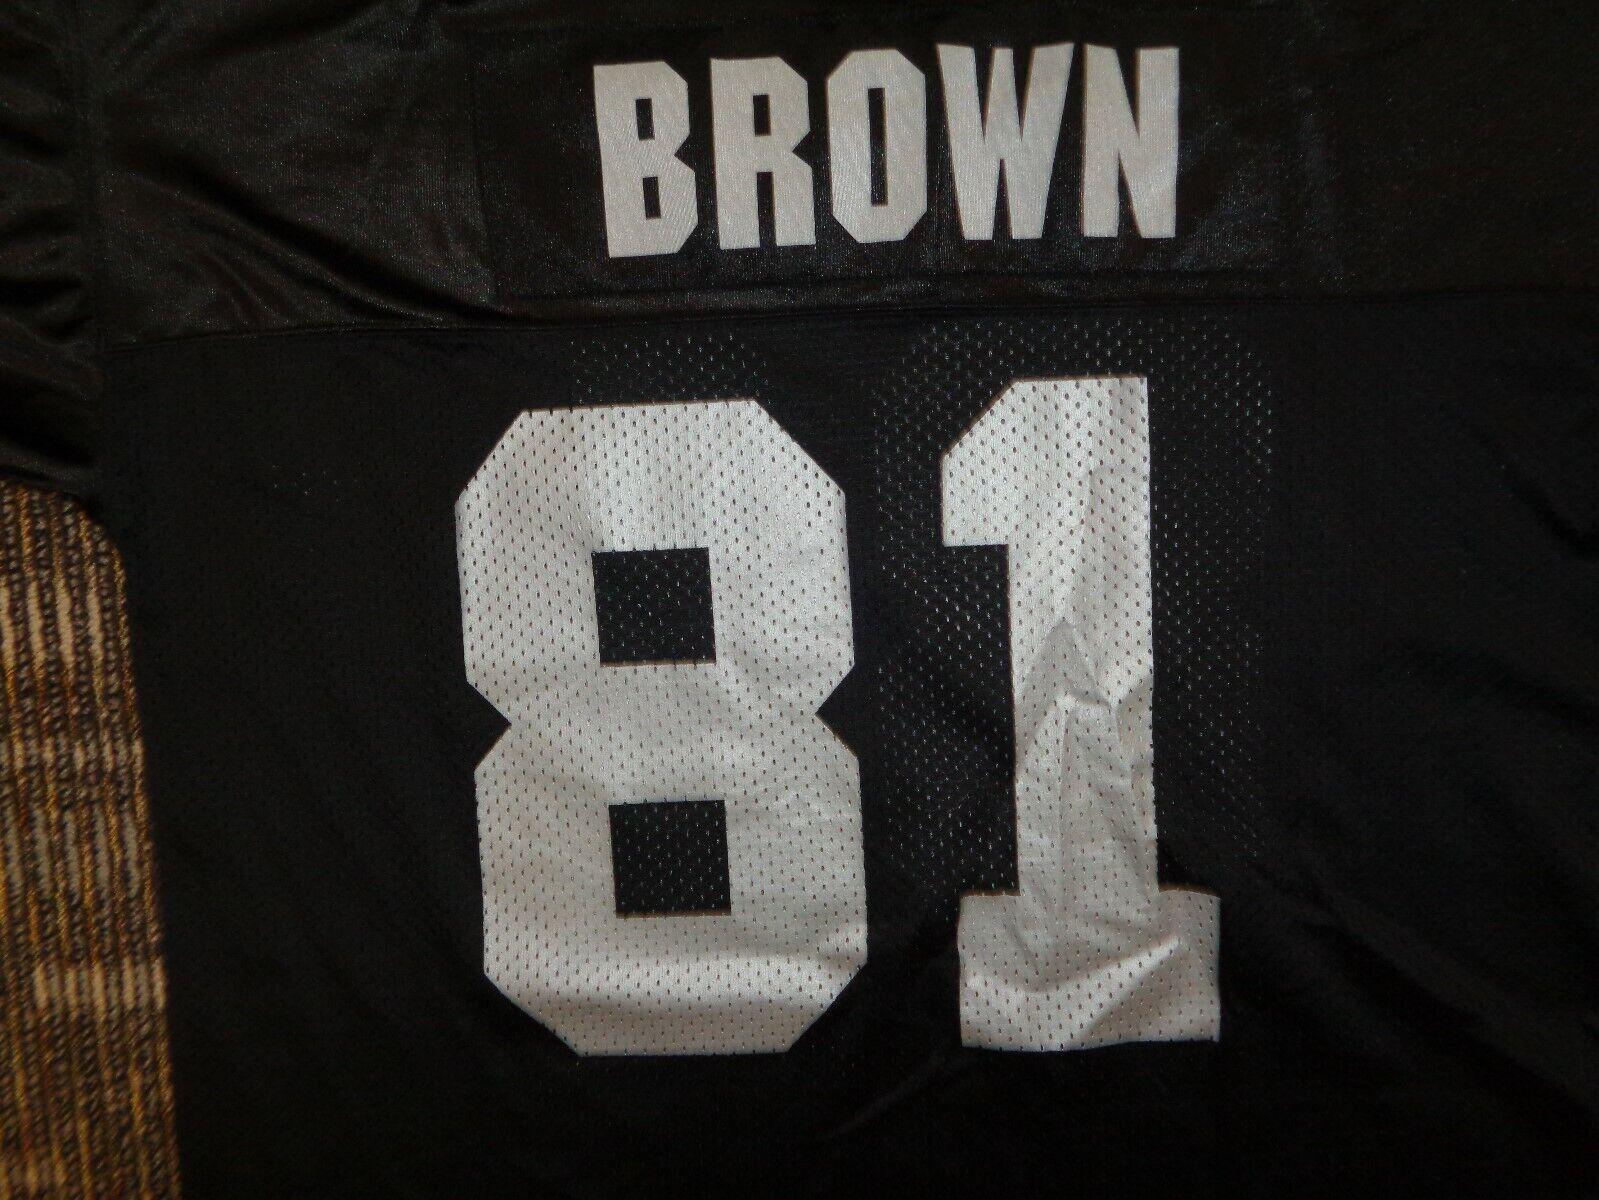 FLAWLESS TIM BROWN OAKLAND LA LAS VEGAS RAIDERS STARTER NFL GAME FOOTBALL JERSEY - $69.99